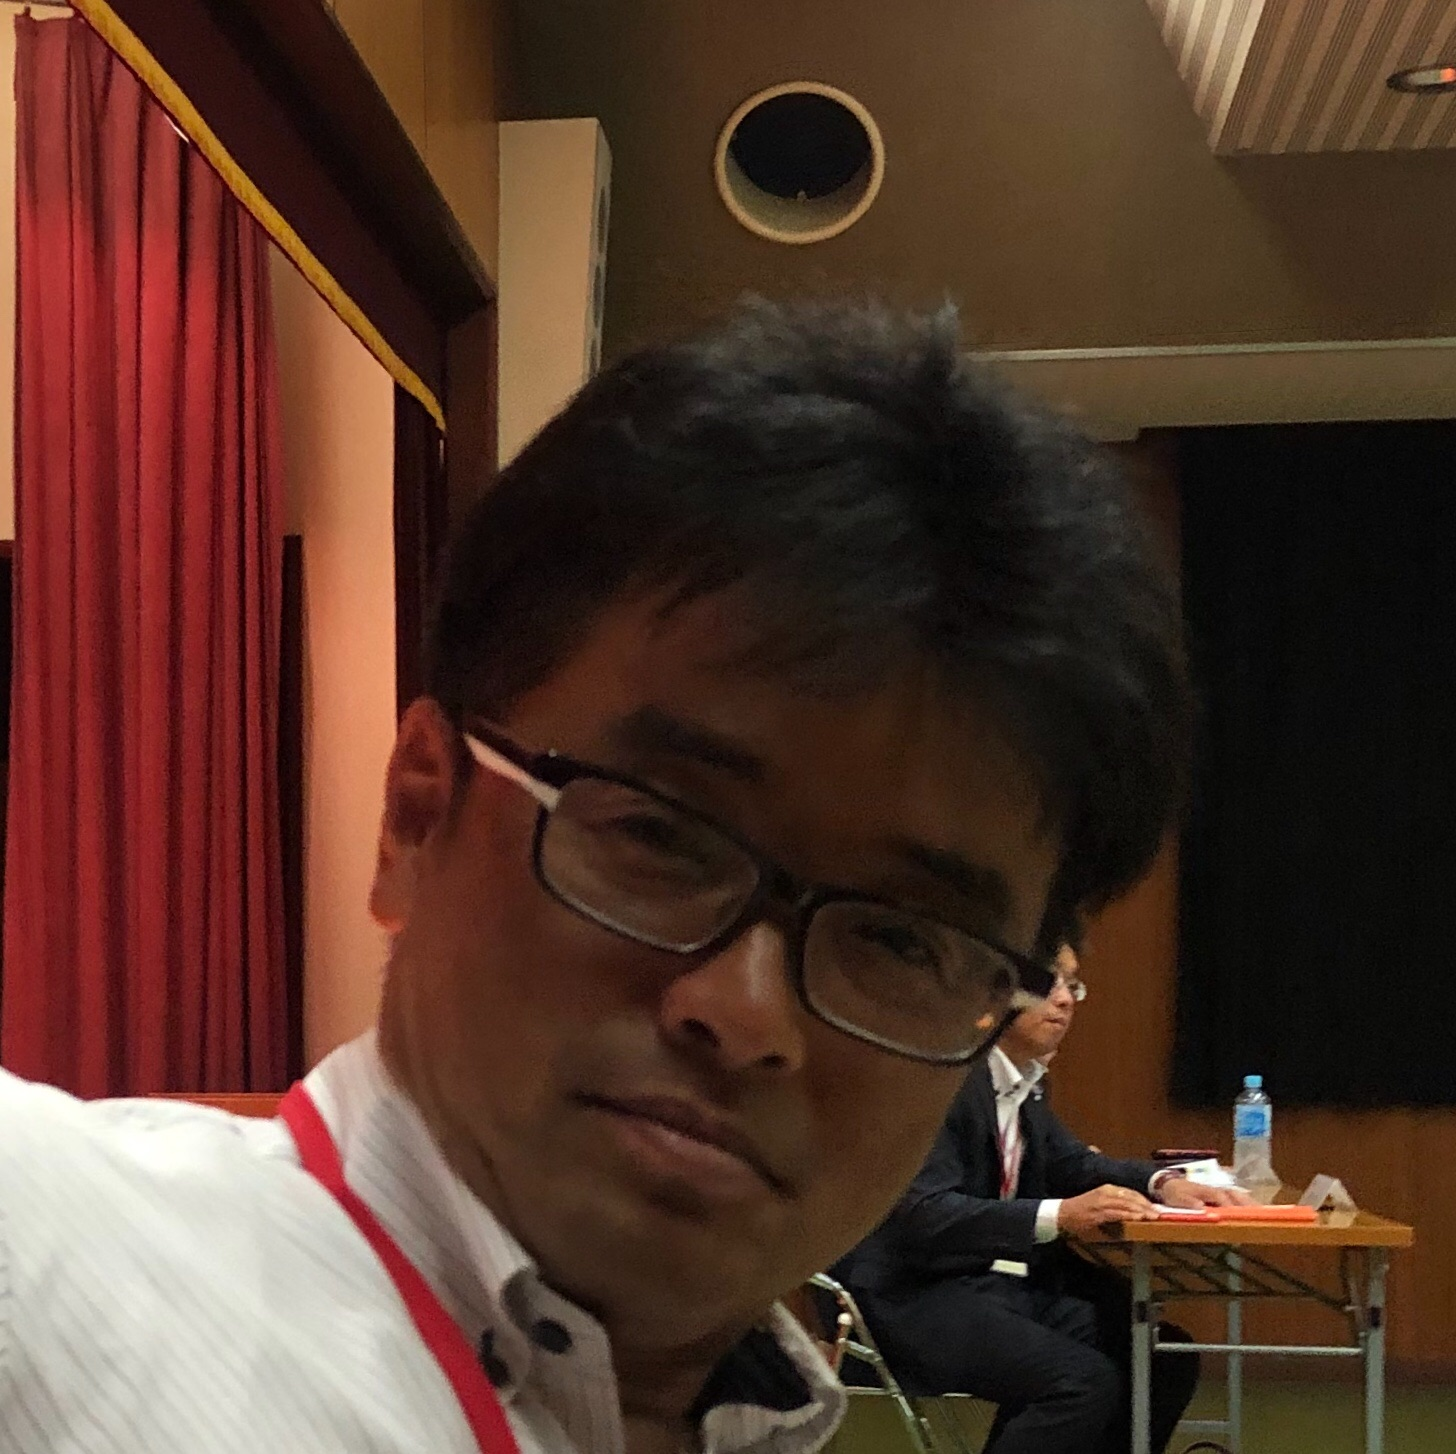 f:id:masanori-kato1972:20190807204010j:image